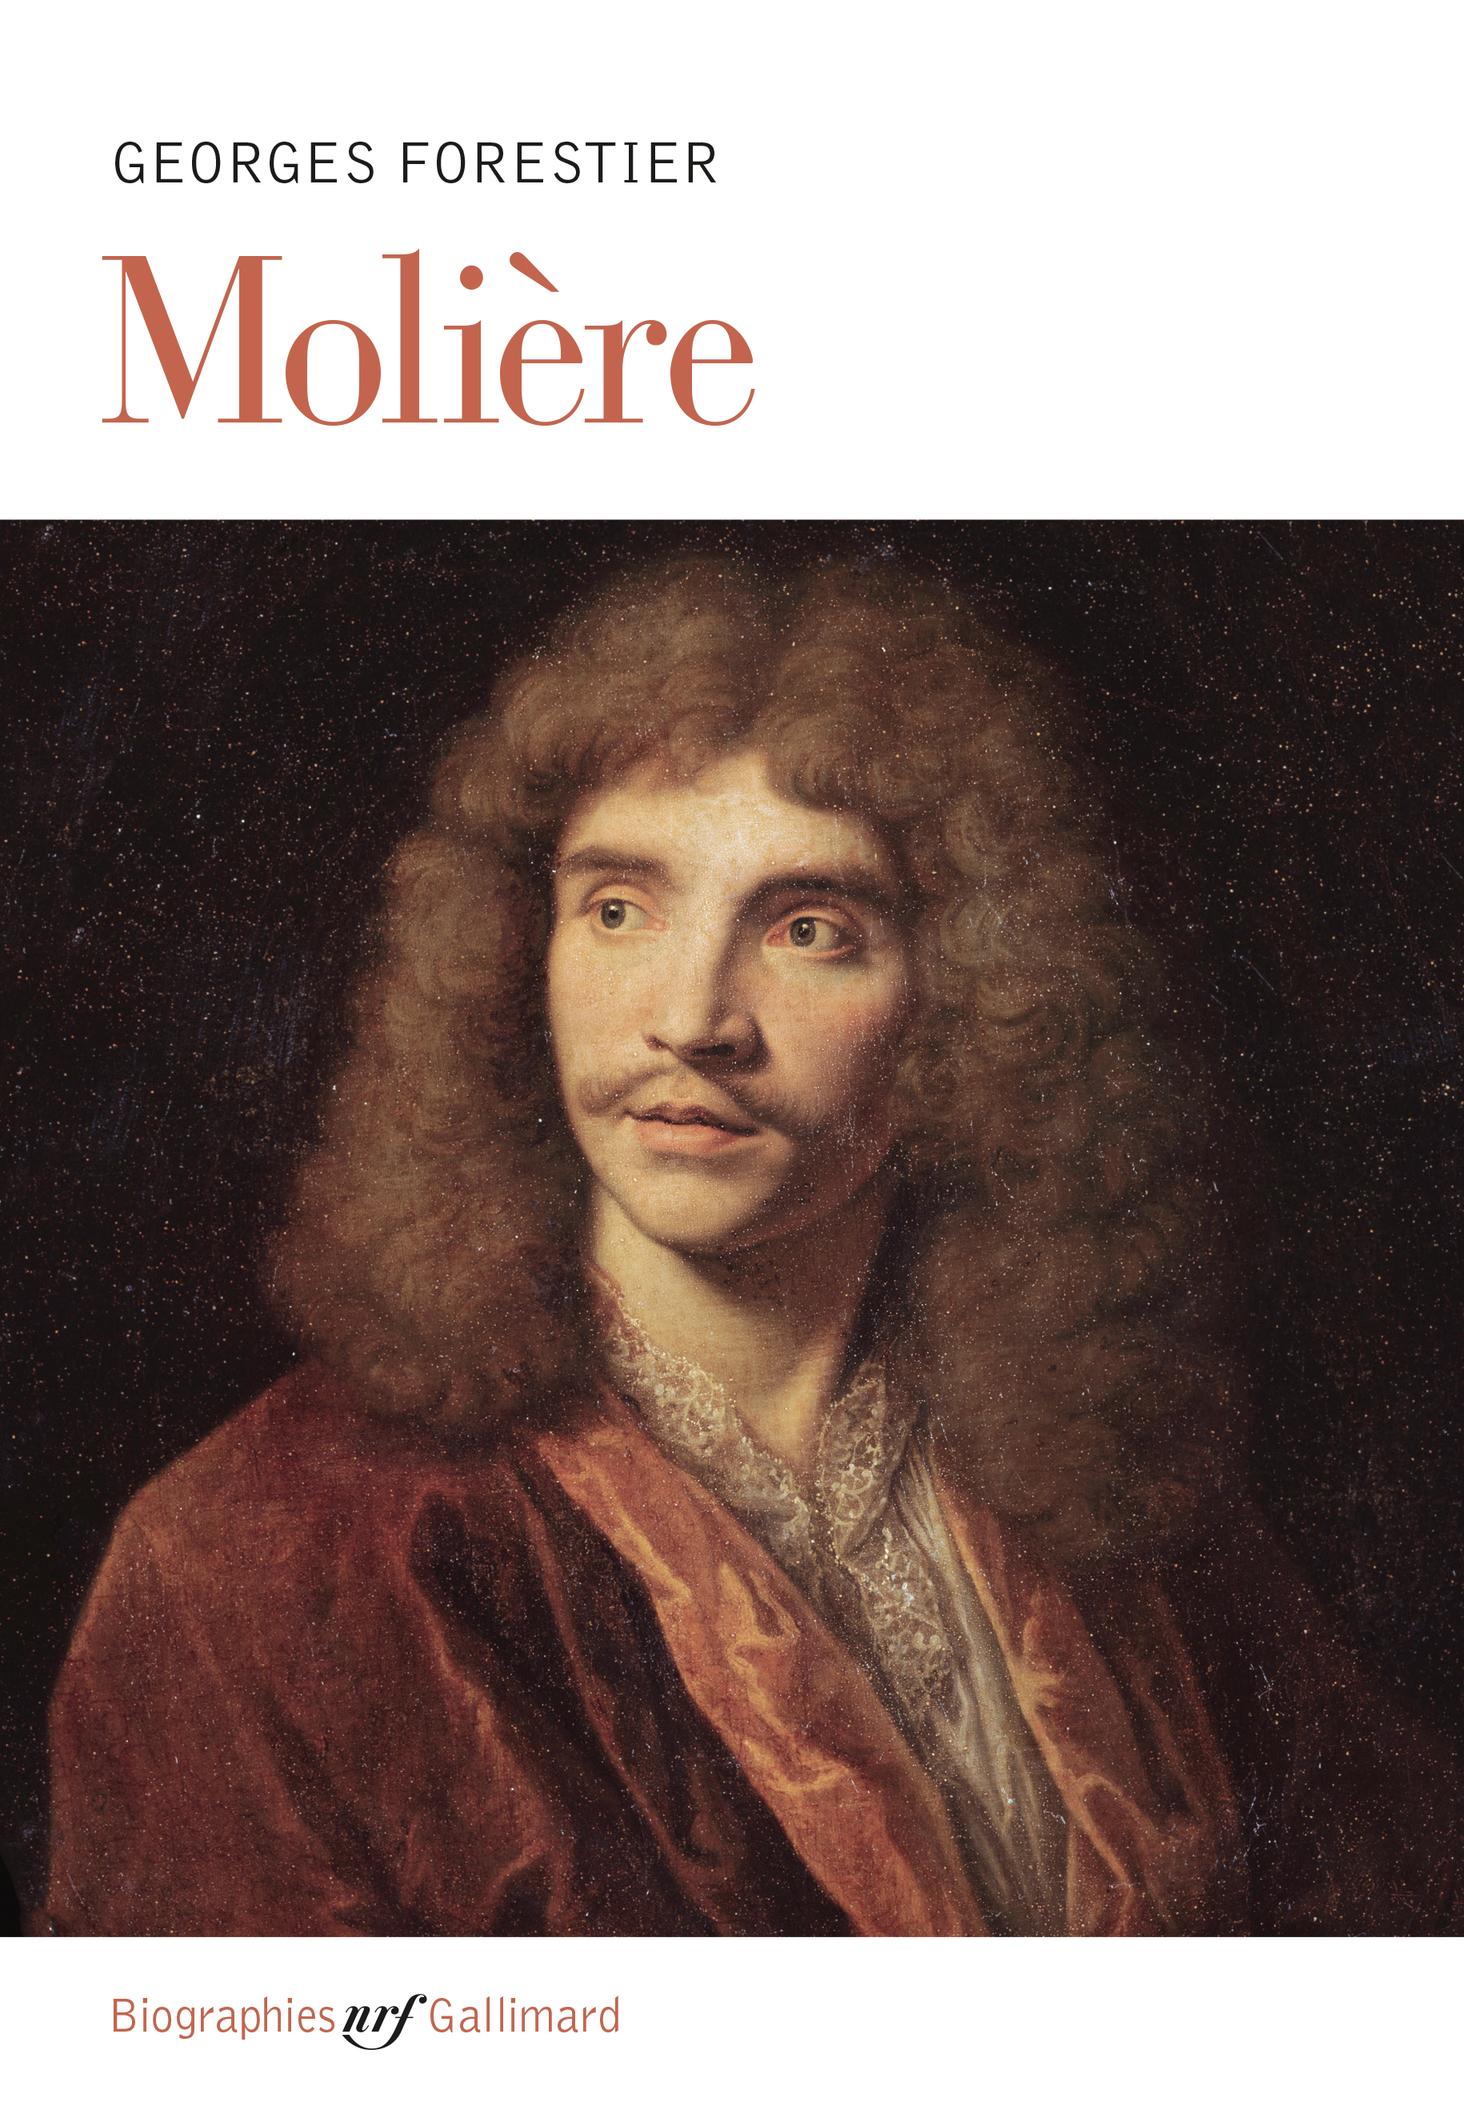 G. Forestier, Molière